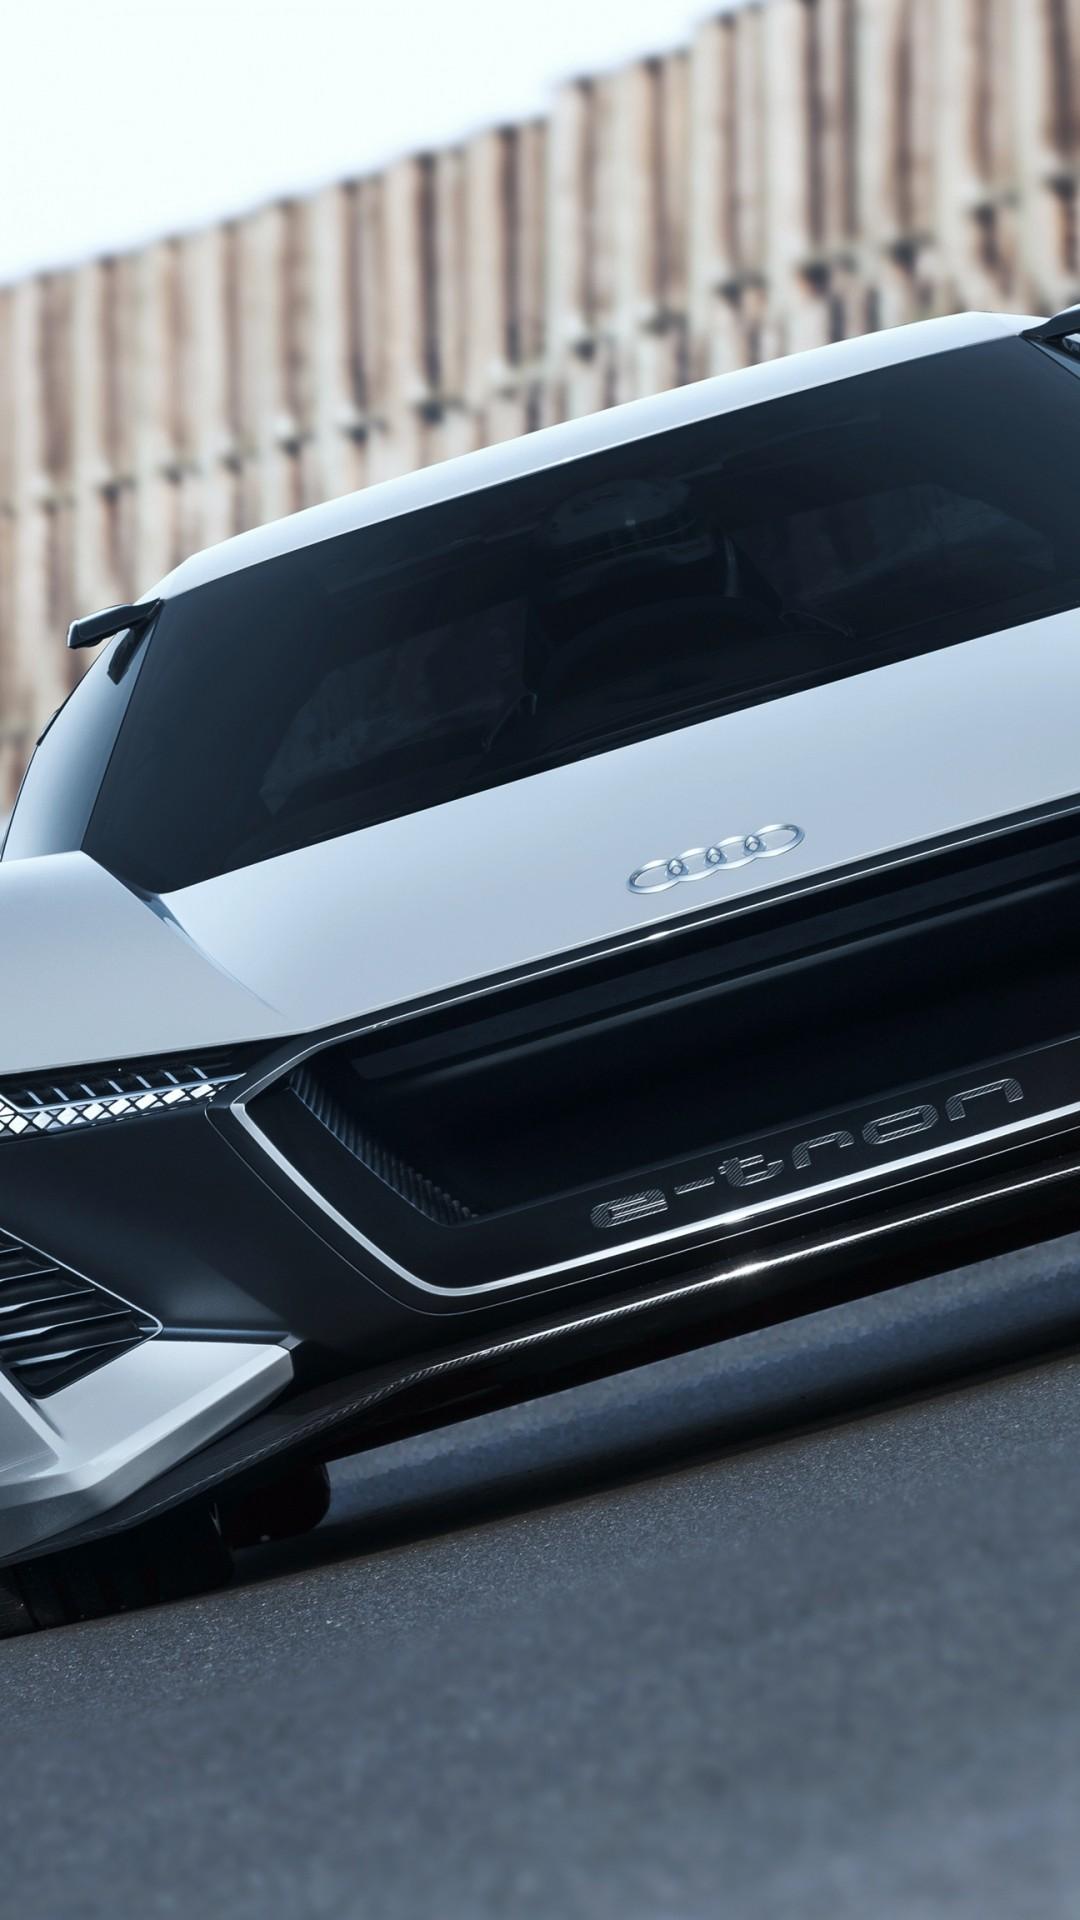 E-tron, Futuristic Cars - Audi E Tron Gtr , HD Wallpaper & Backgrounds